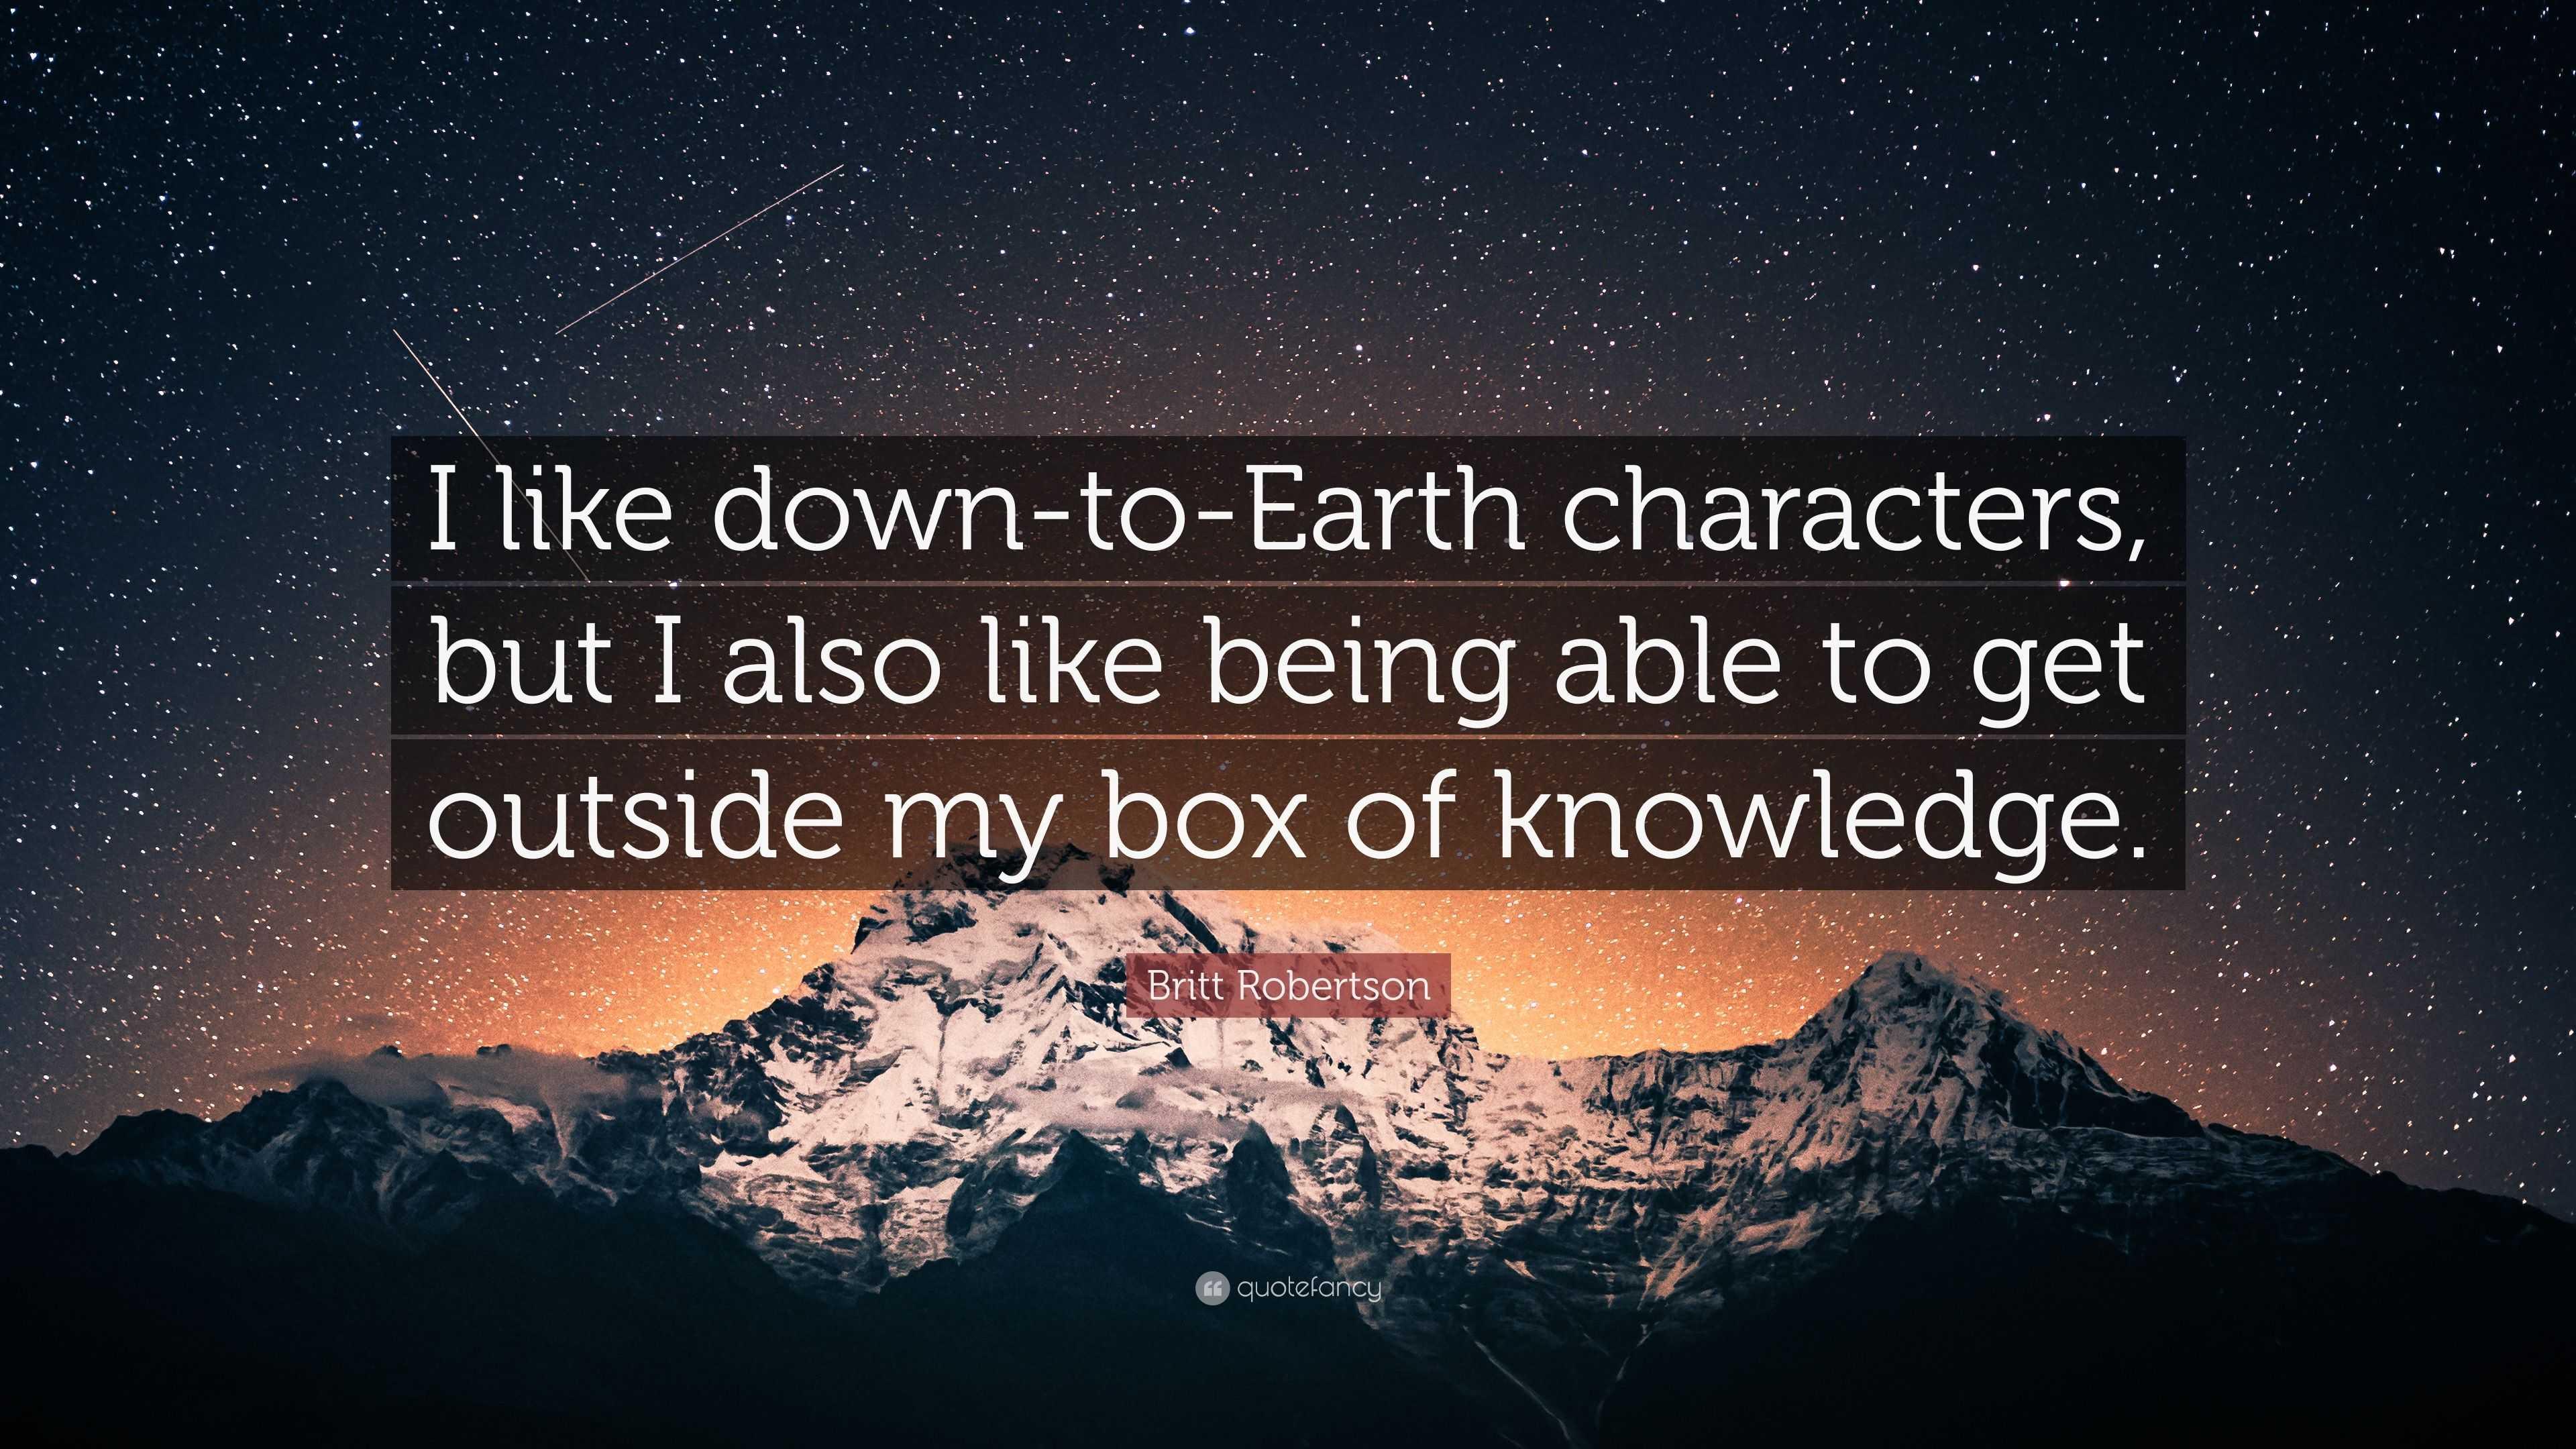 like stars on earth characters